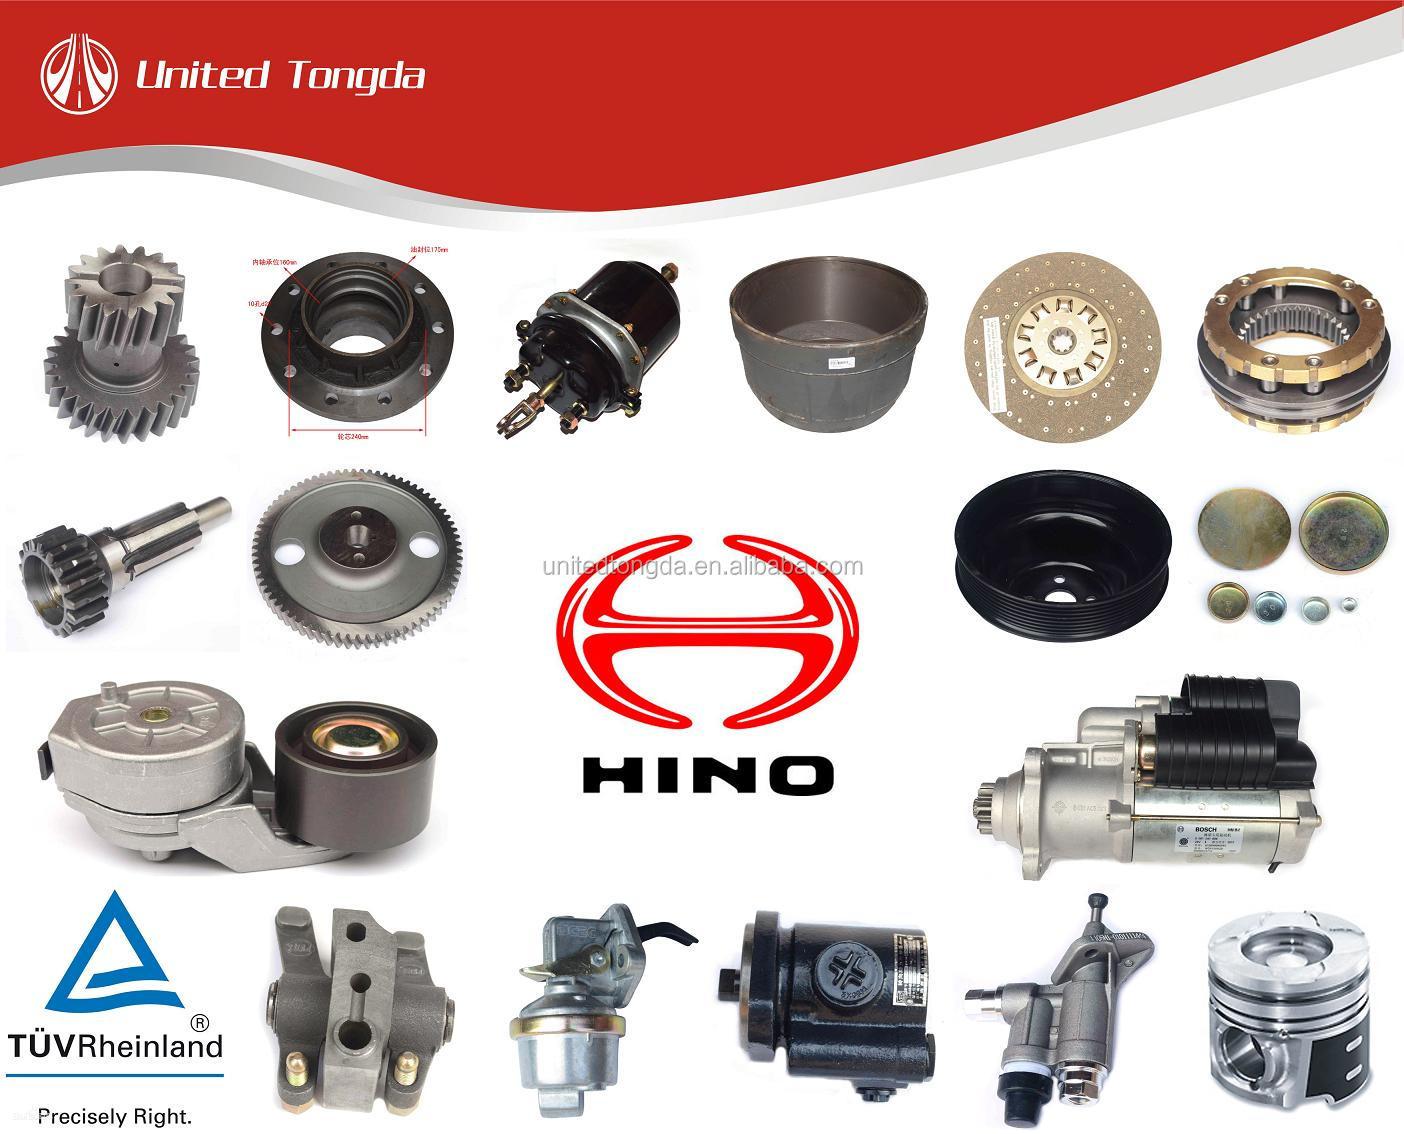 Hino Engine Parts : Hino truck spare parts motorsportwjd